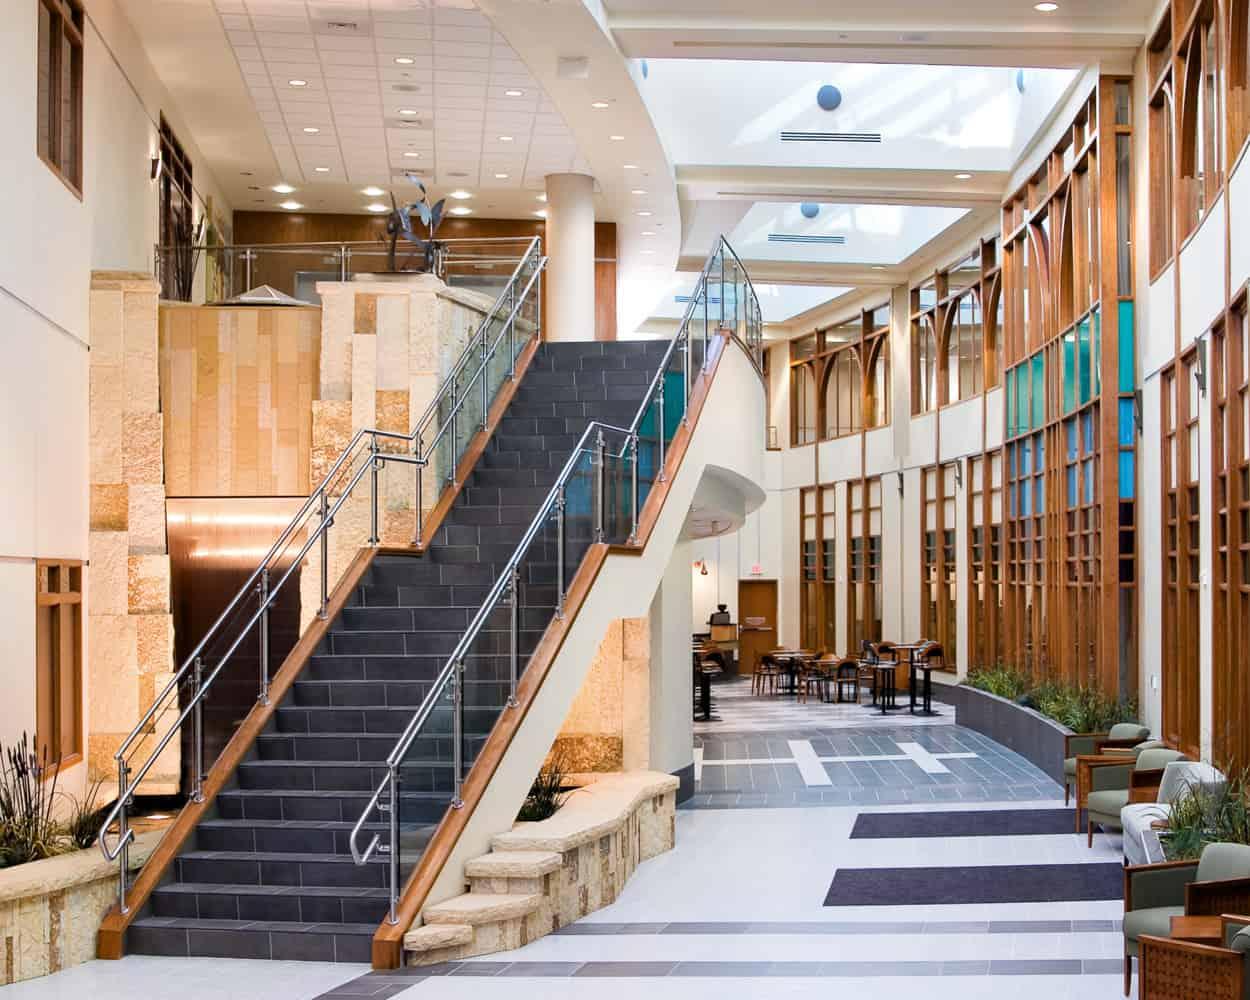 AVERA MCKENNAN HOSPITAL AVERA BEHAVIORAL HEALTH CENTER